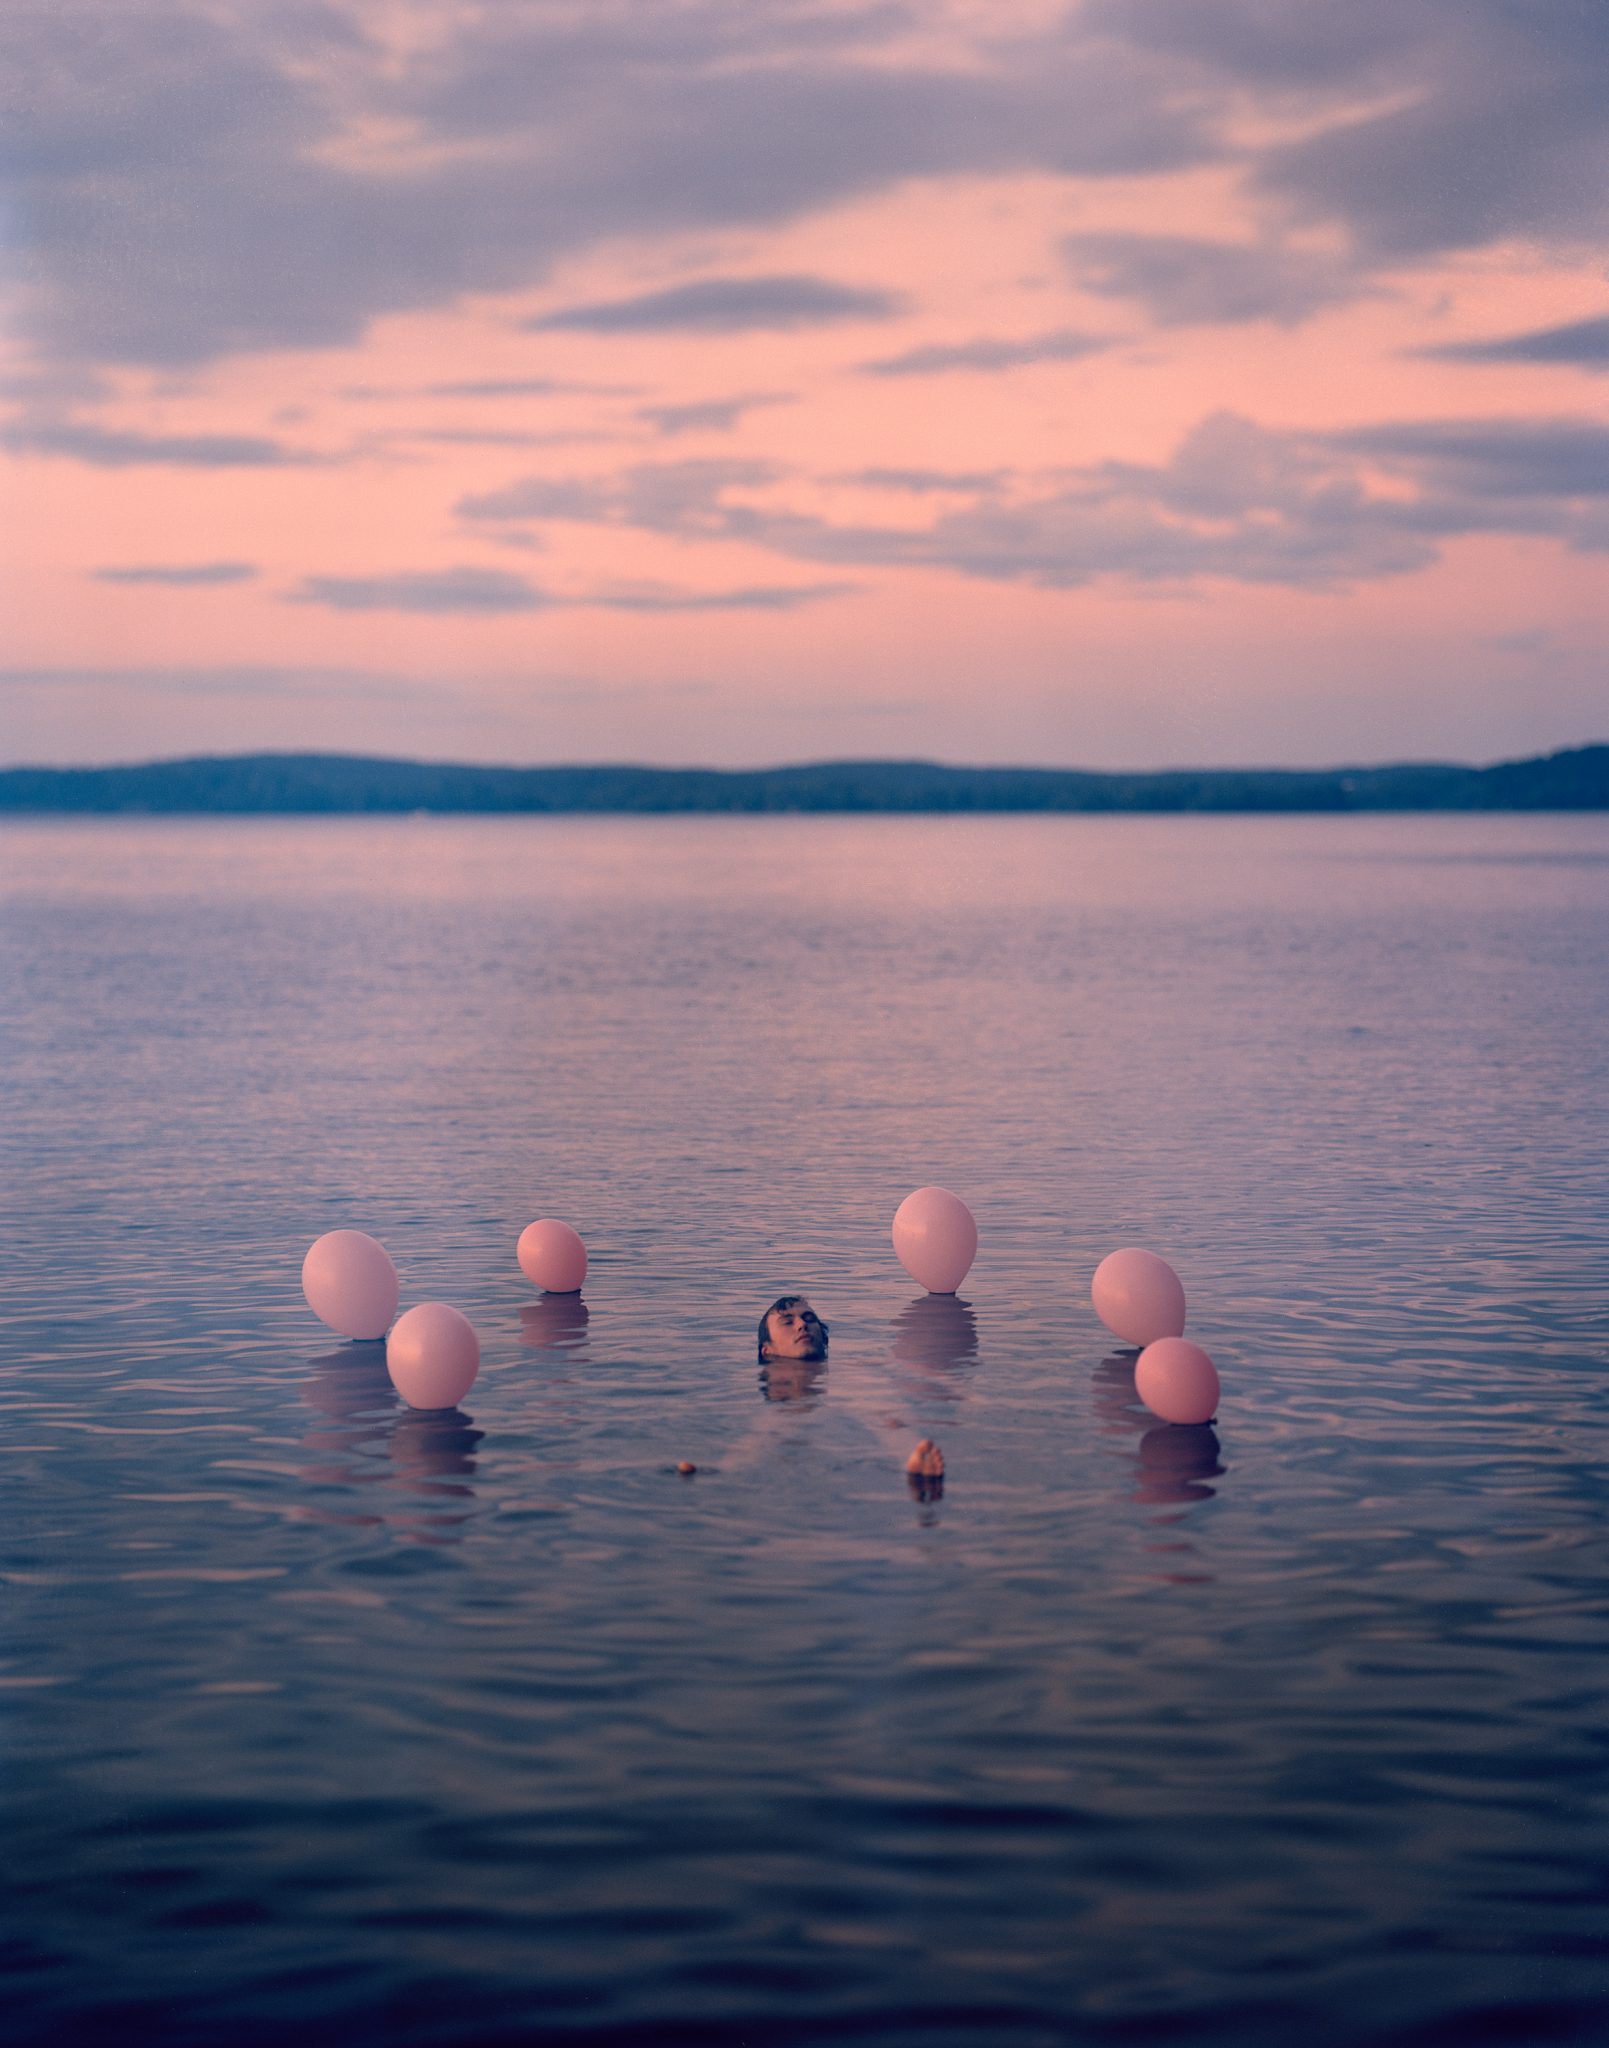 06_Henri Airo - Keep Swimming - 30 - Untitled (Float) - 9cbb6d6f-2780-487f-a392-5961a4074ed6 copy